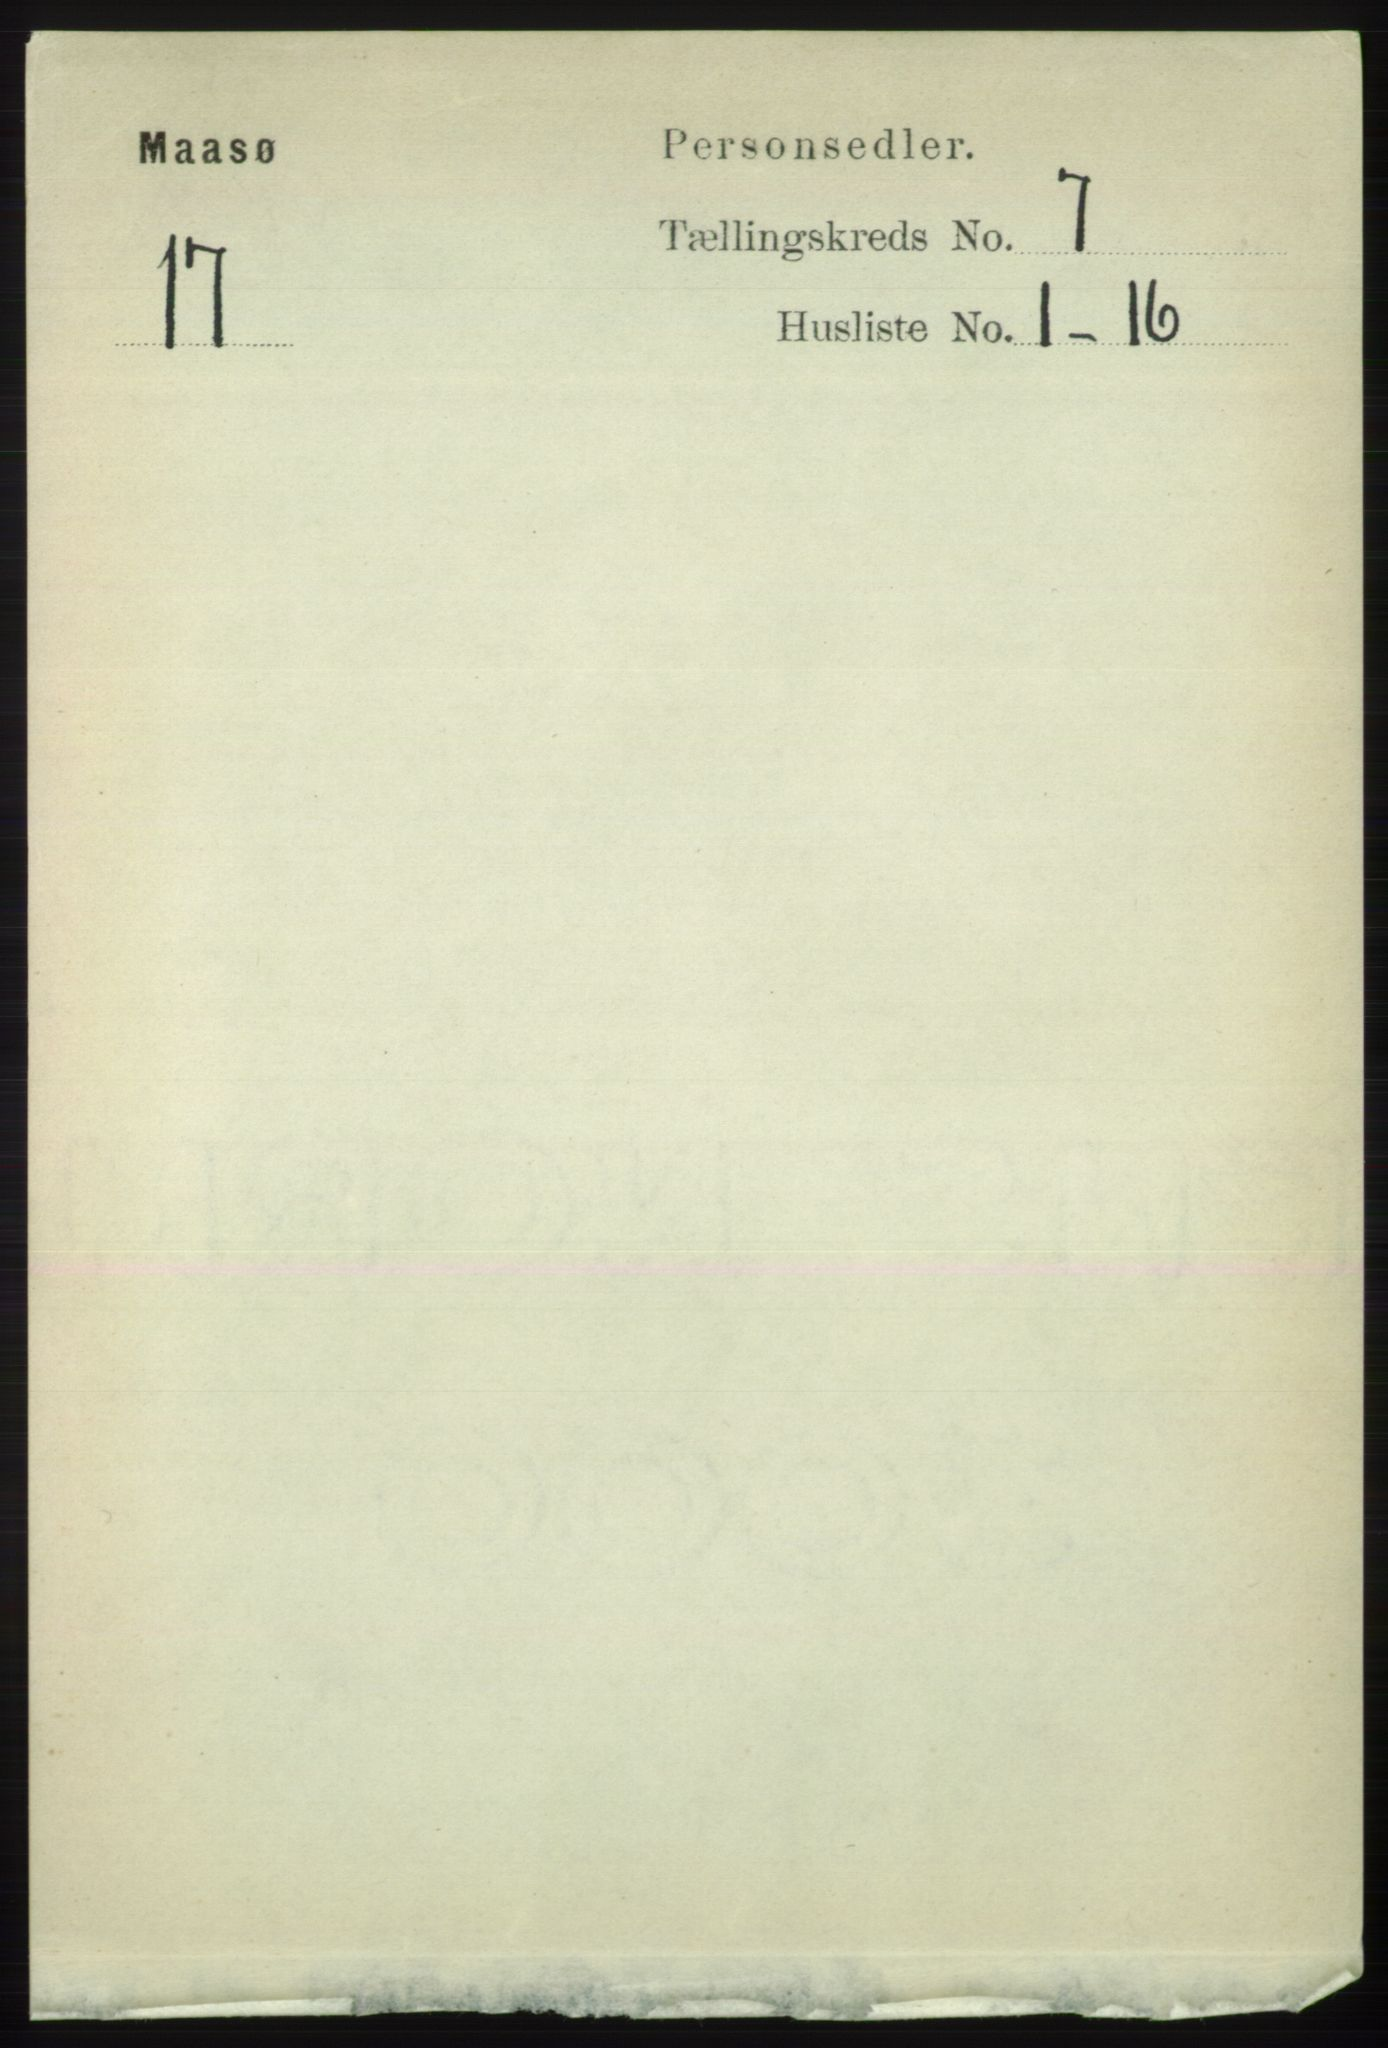 RA, Folketelling 1891 for 2018 Måsøy herred, 1891, s. 1401